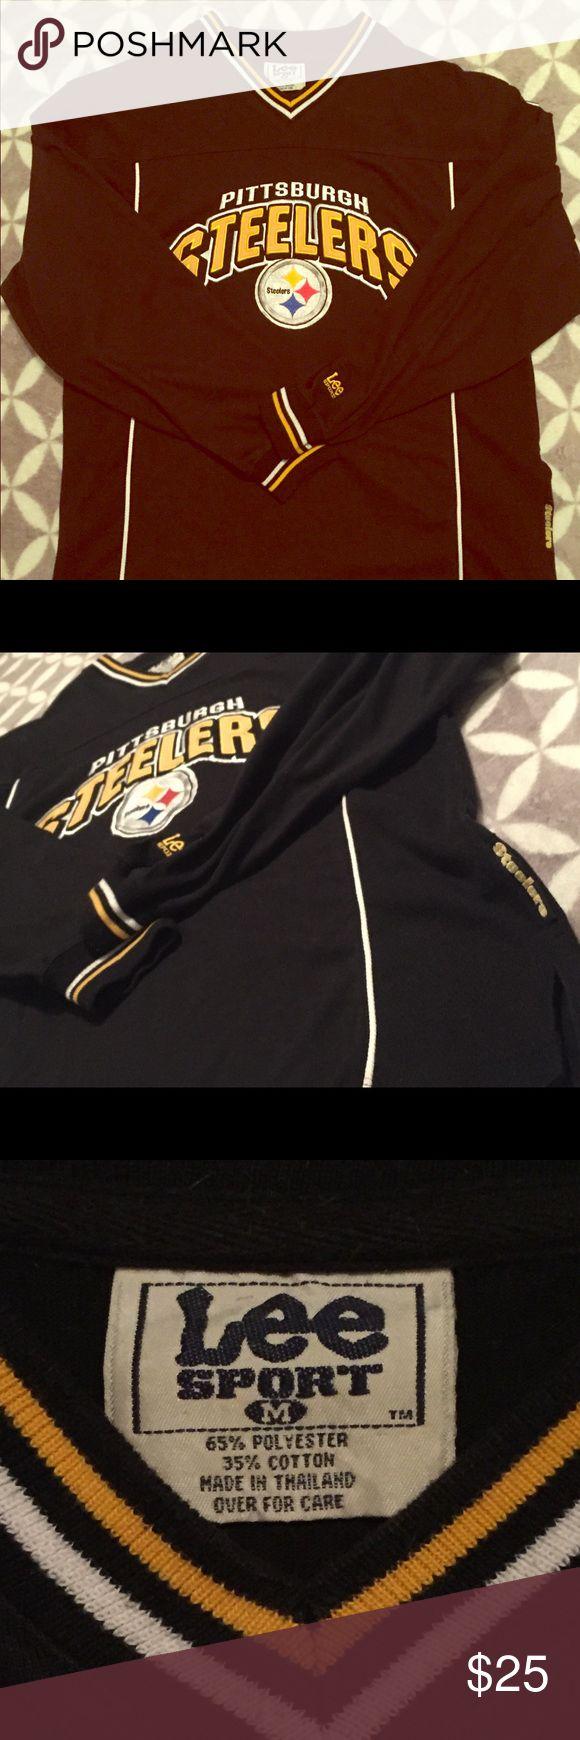 Lee Sport Steelers sweatshirt This Steelers sweatshirt is in perfect condition. Size medium. Open to offers. Lee Sport Sweaters V-Neck